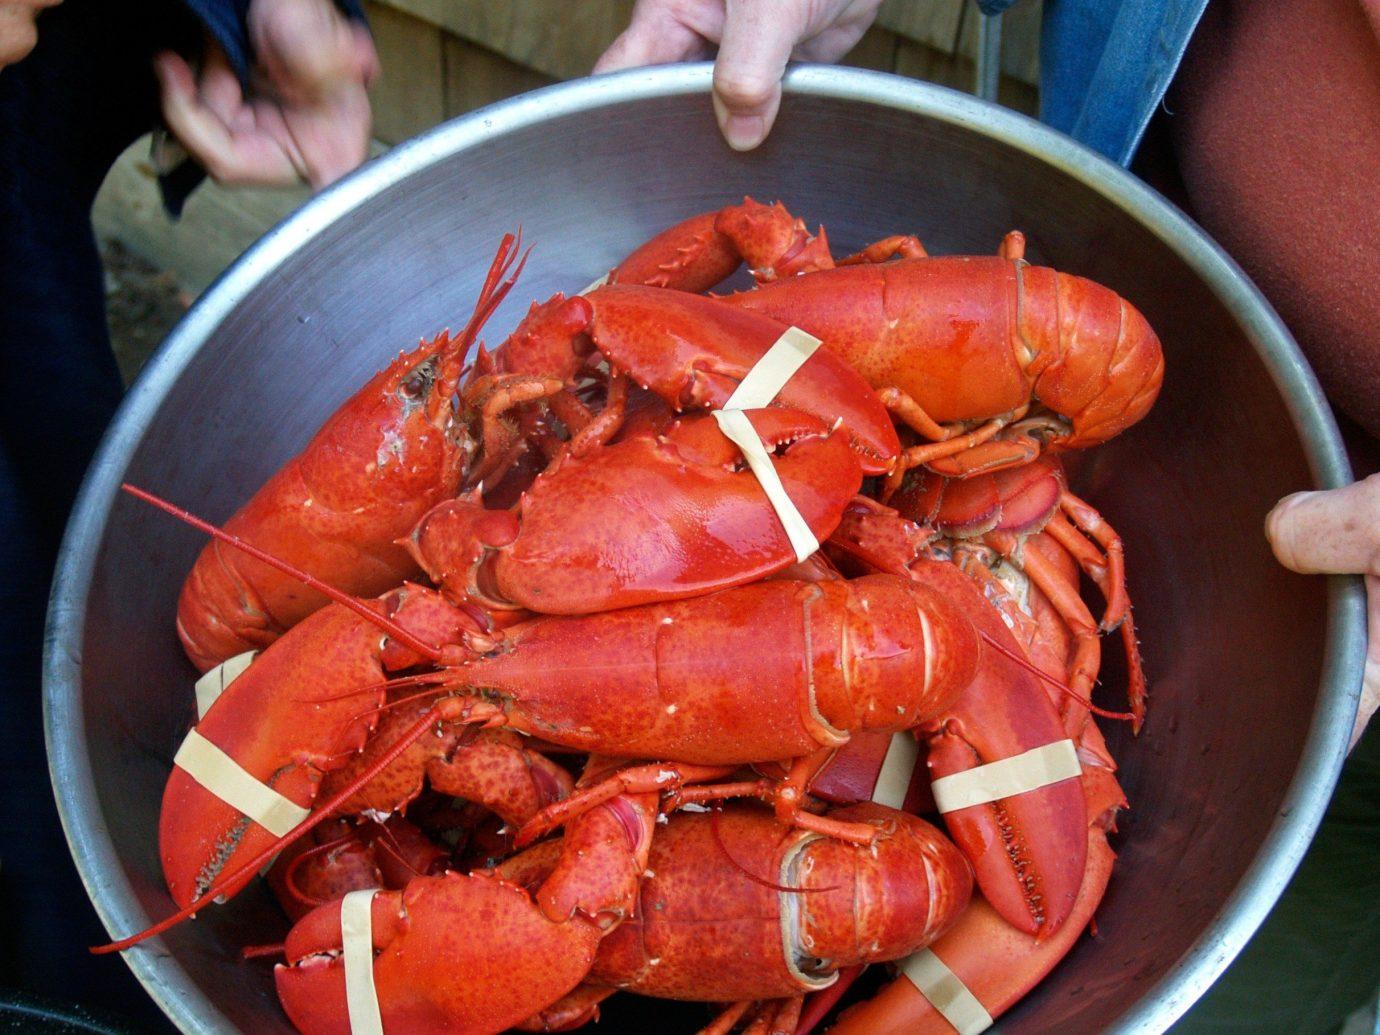 Beach arthropod invertebrate animal person lobster food crustacean dungeness crab decapoda Seafood american lobster animal source foods seafood boil fish crab king crab produce crayfish